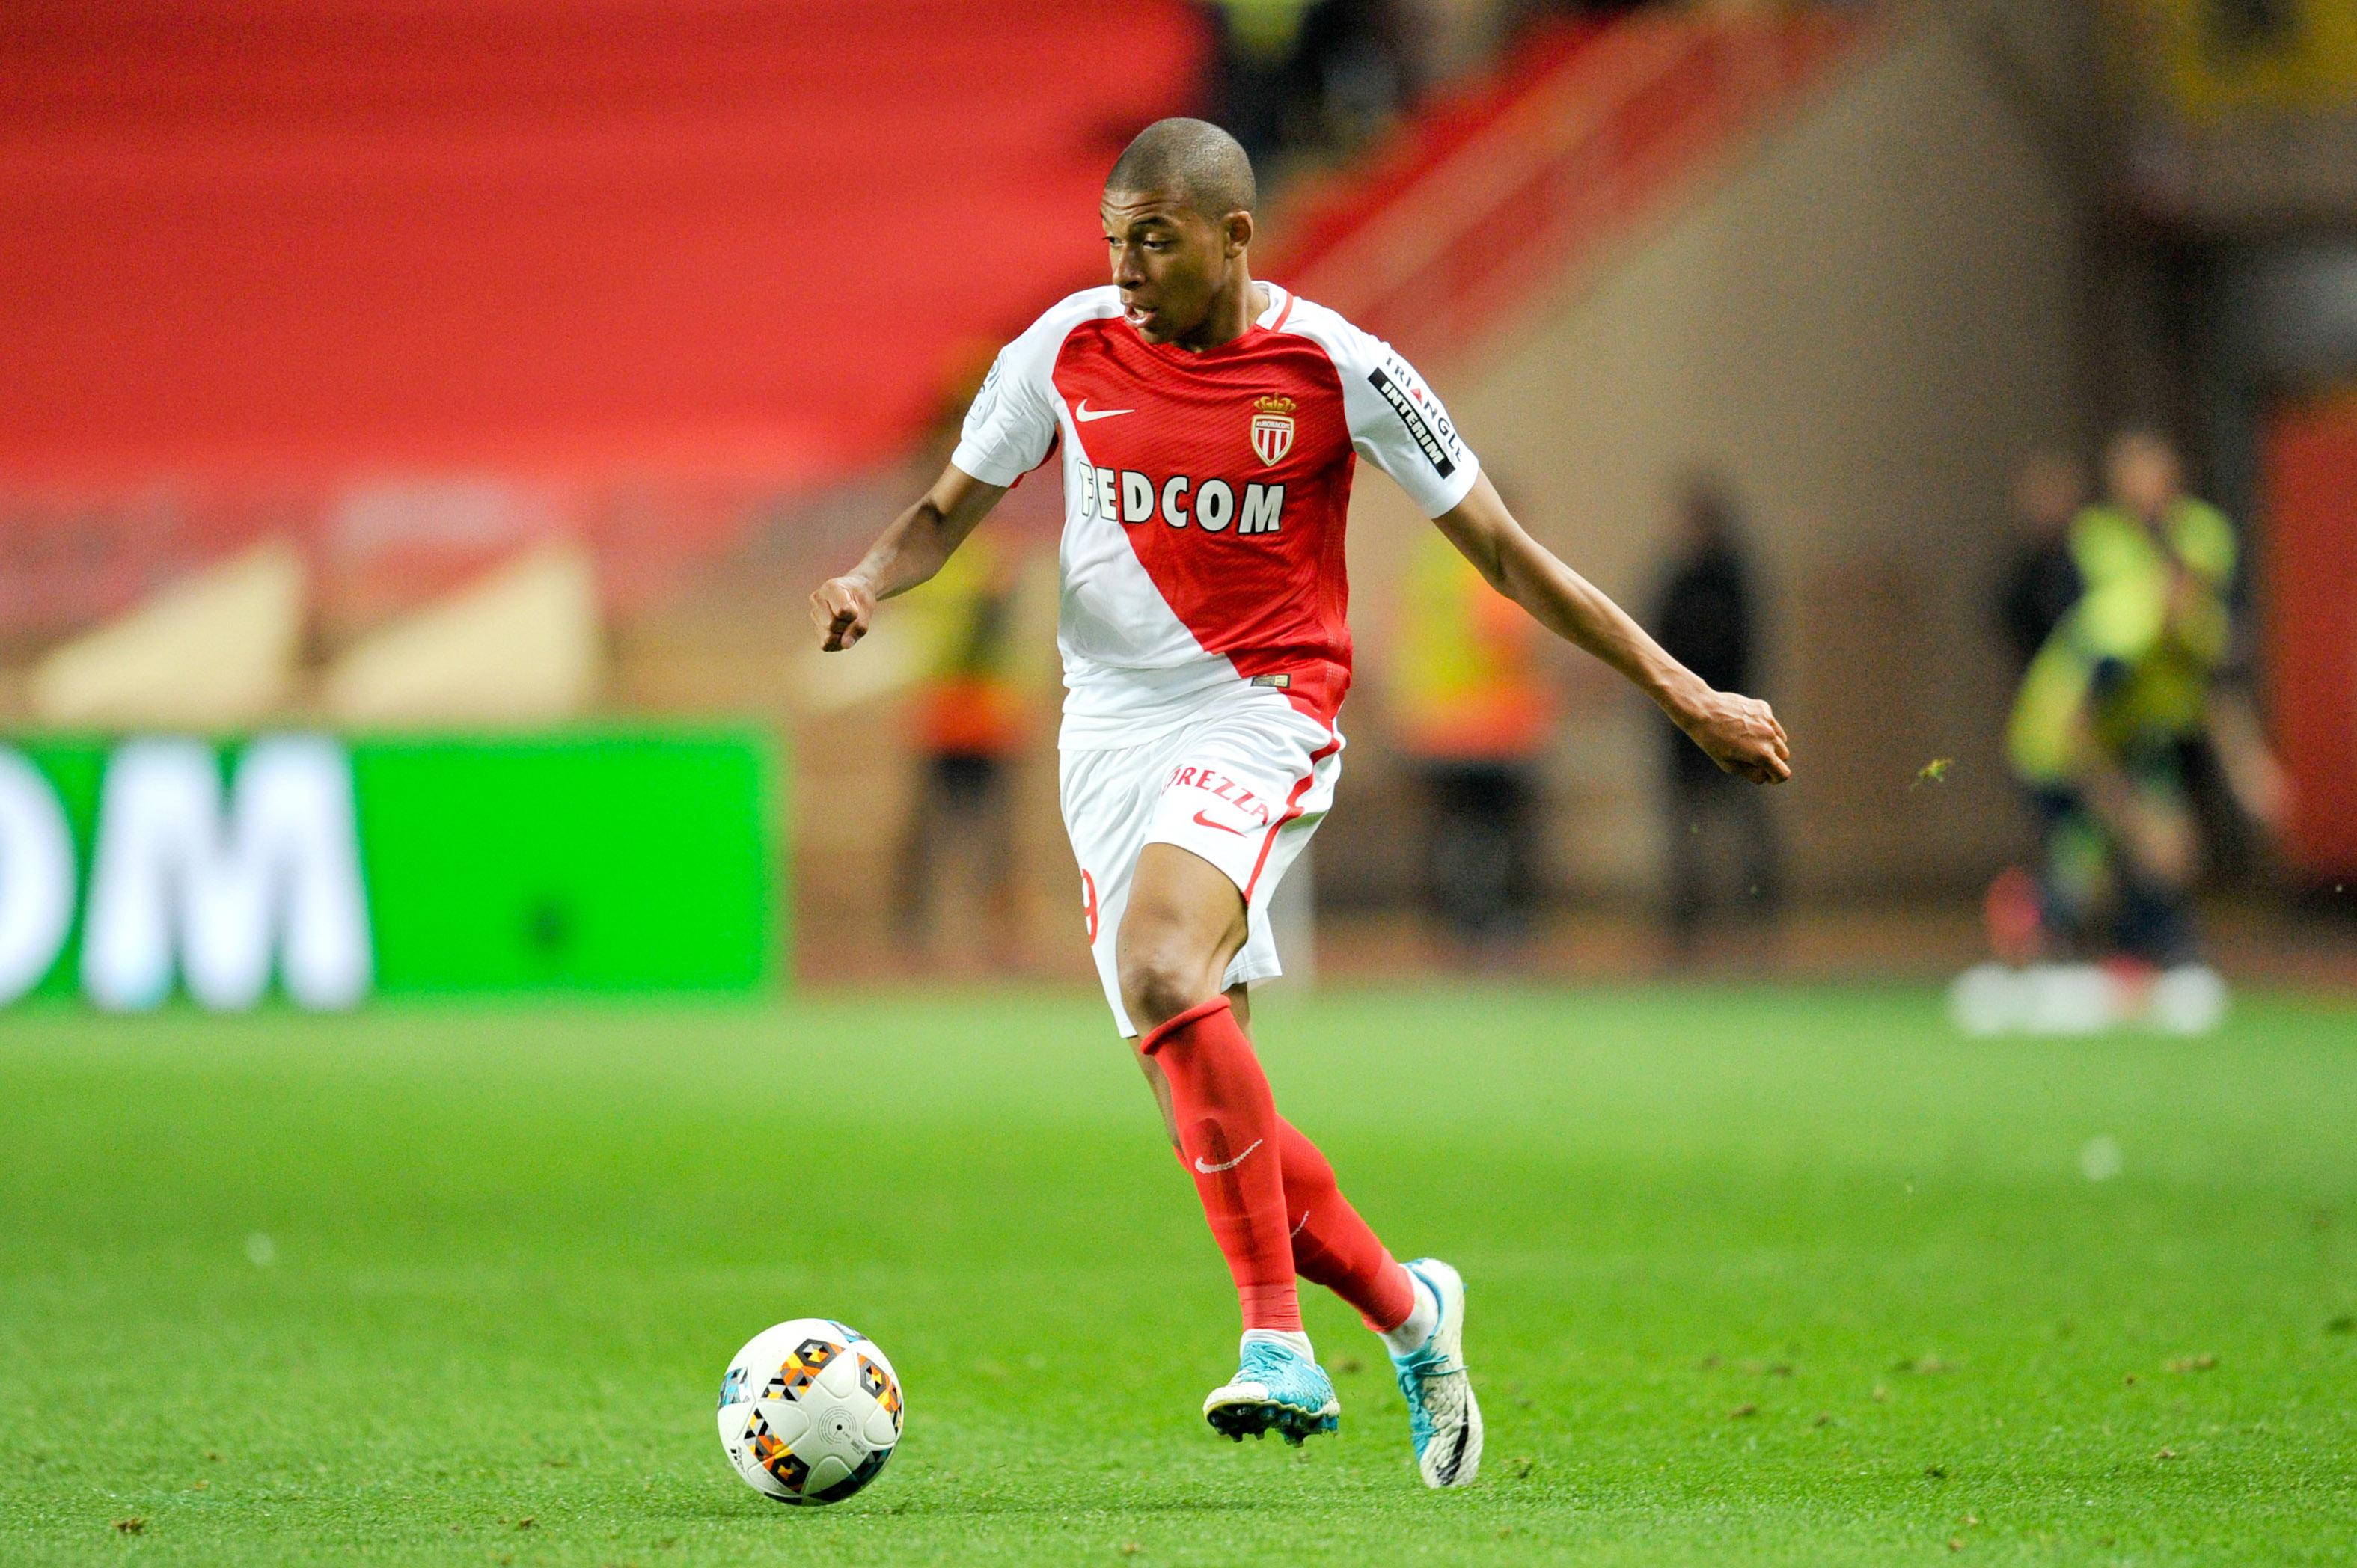 Football - Transferts - Mbappé plus cher que Neymar ?